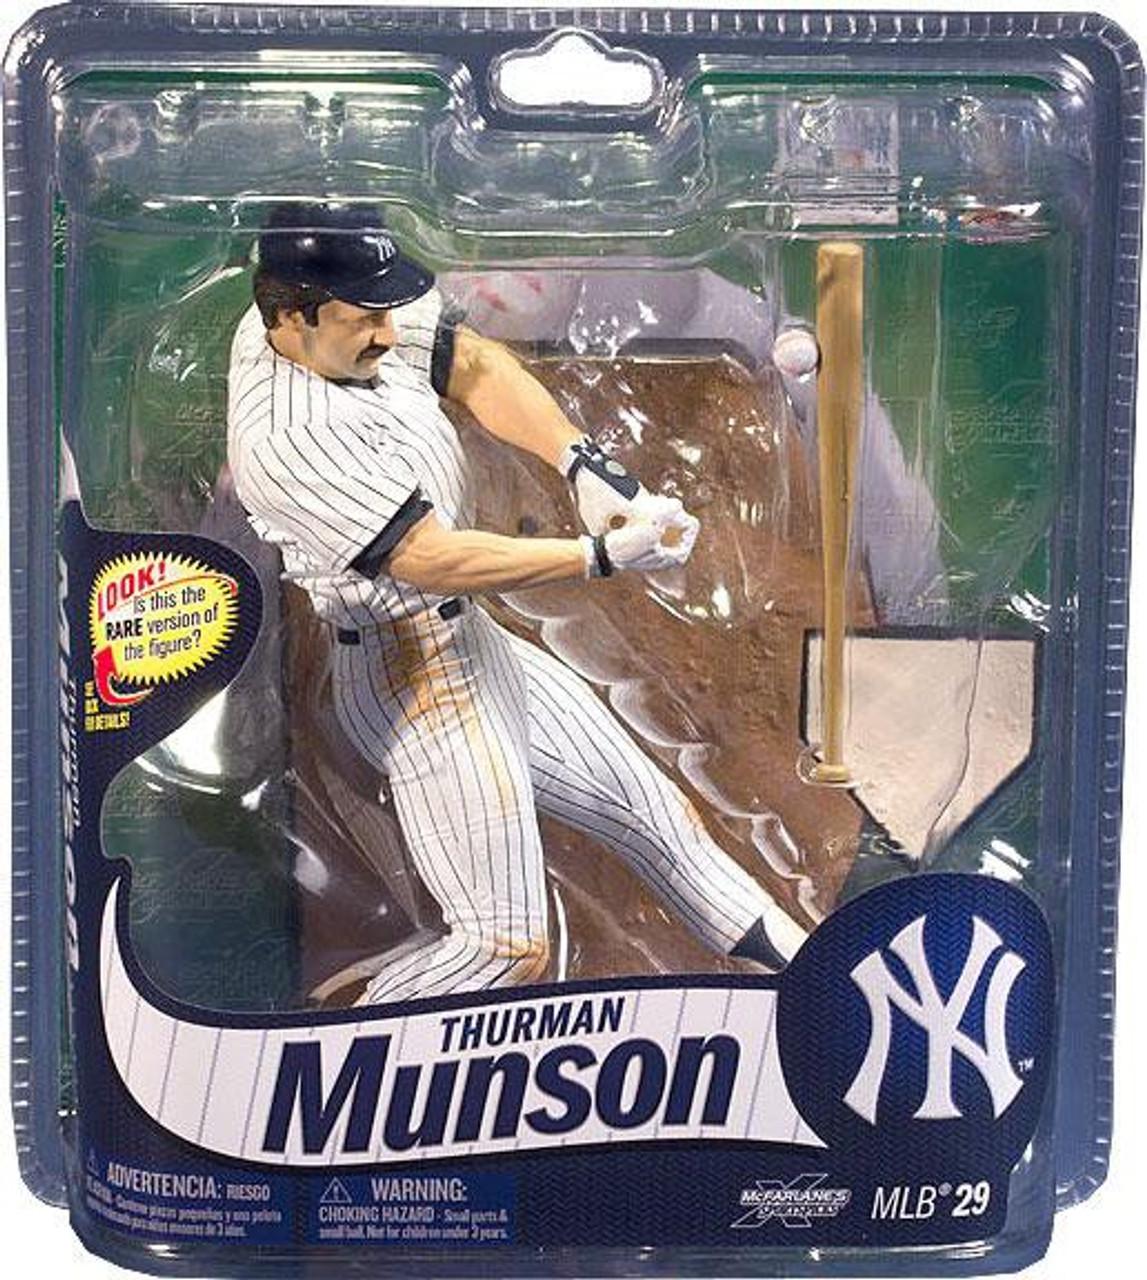 McFarlane Toys MLB New York Yankees Sports Picks Series 29 Thurman Munson Action Figure [White Jersey With Pinstripes]